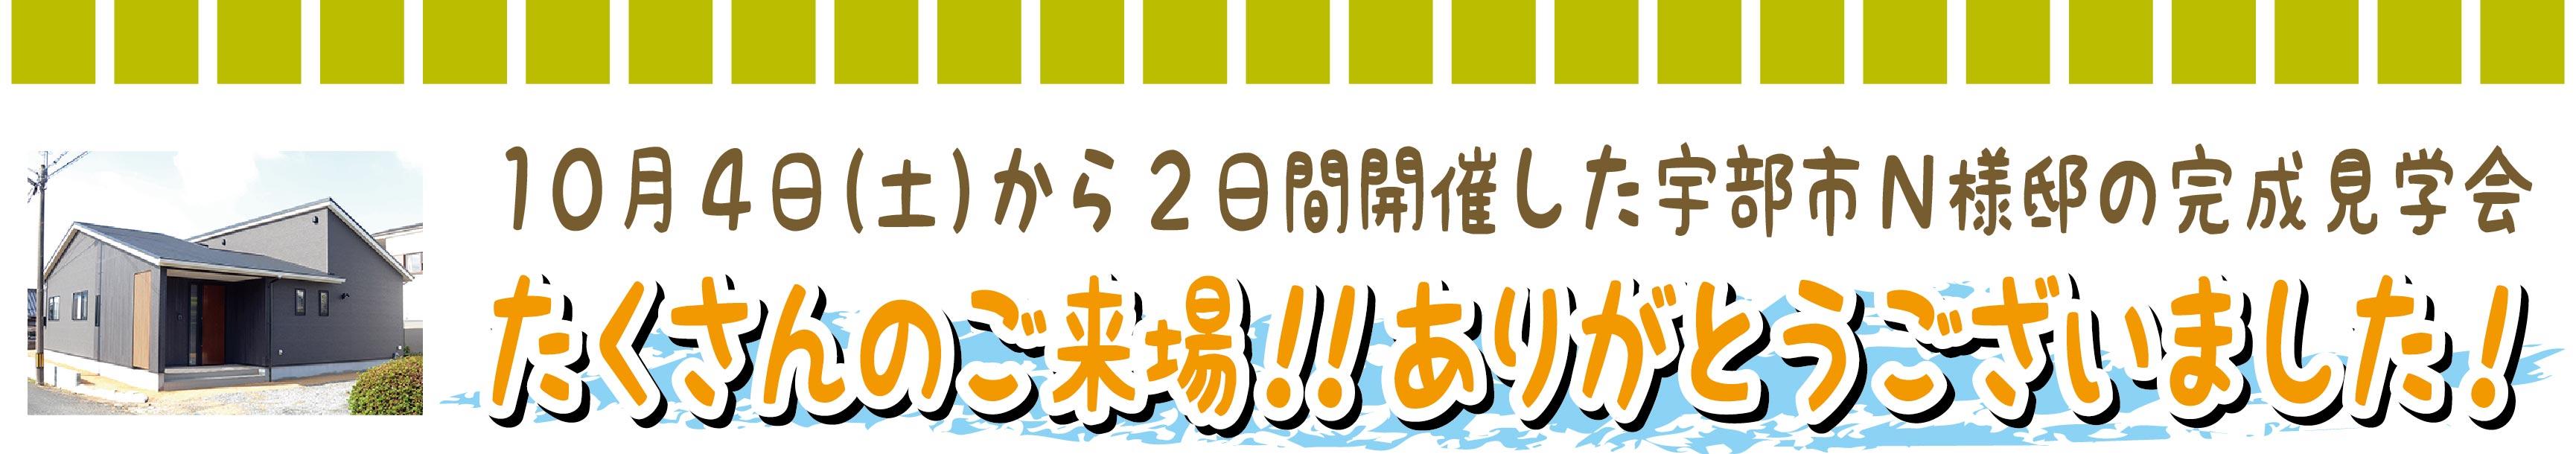 KuraSi-natu-sin89-08.jpg